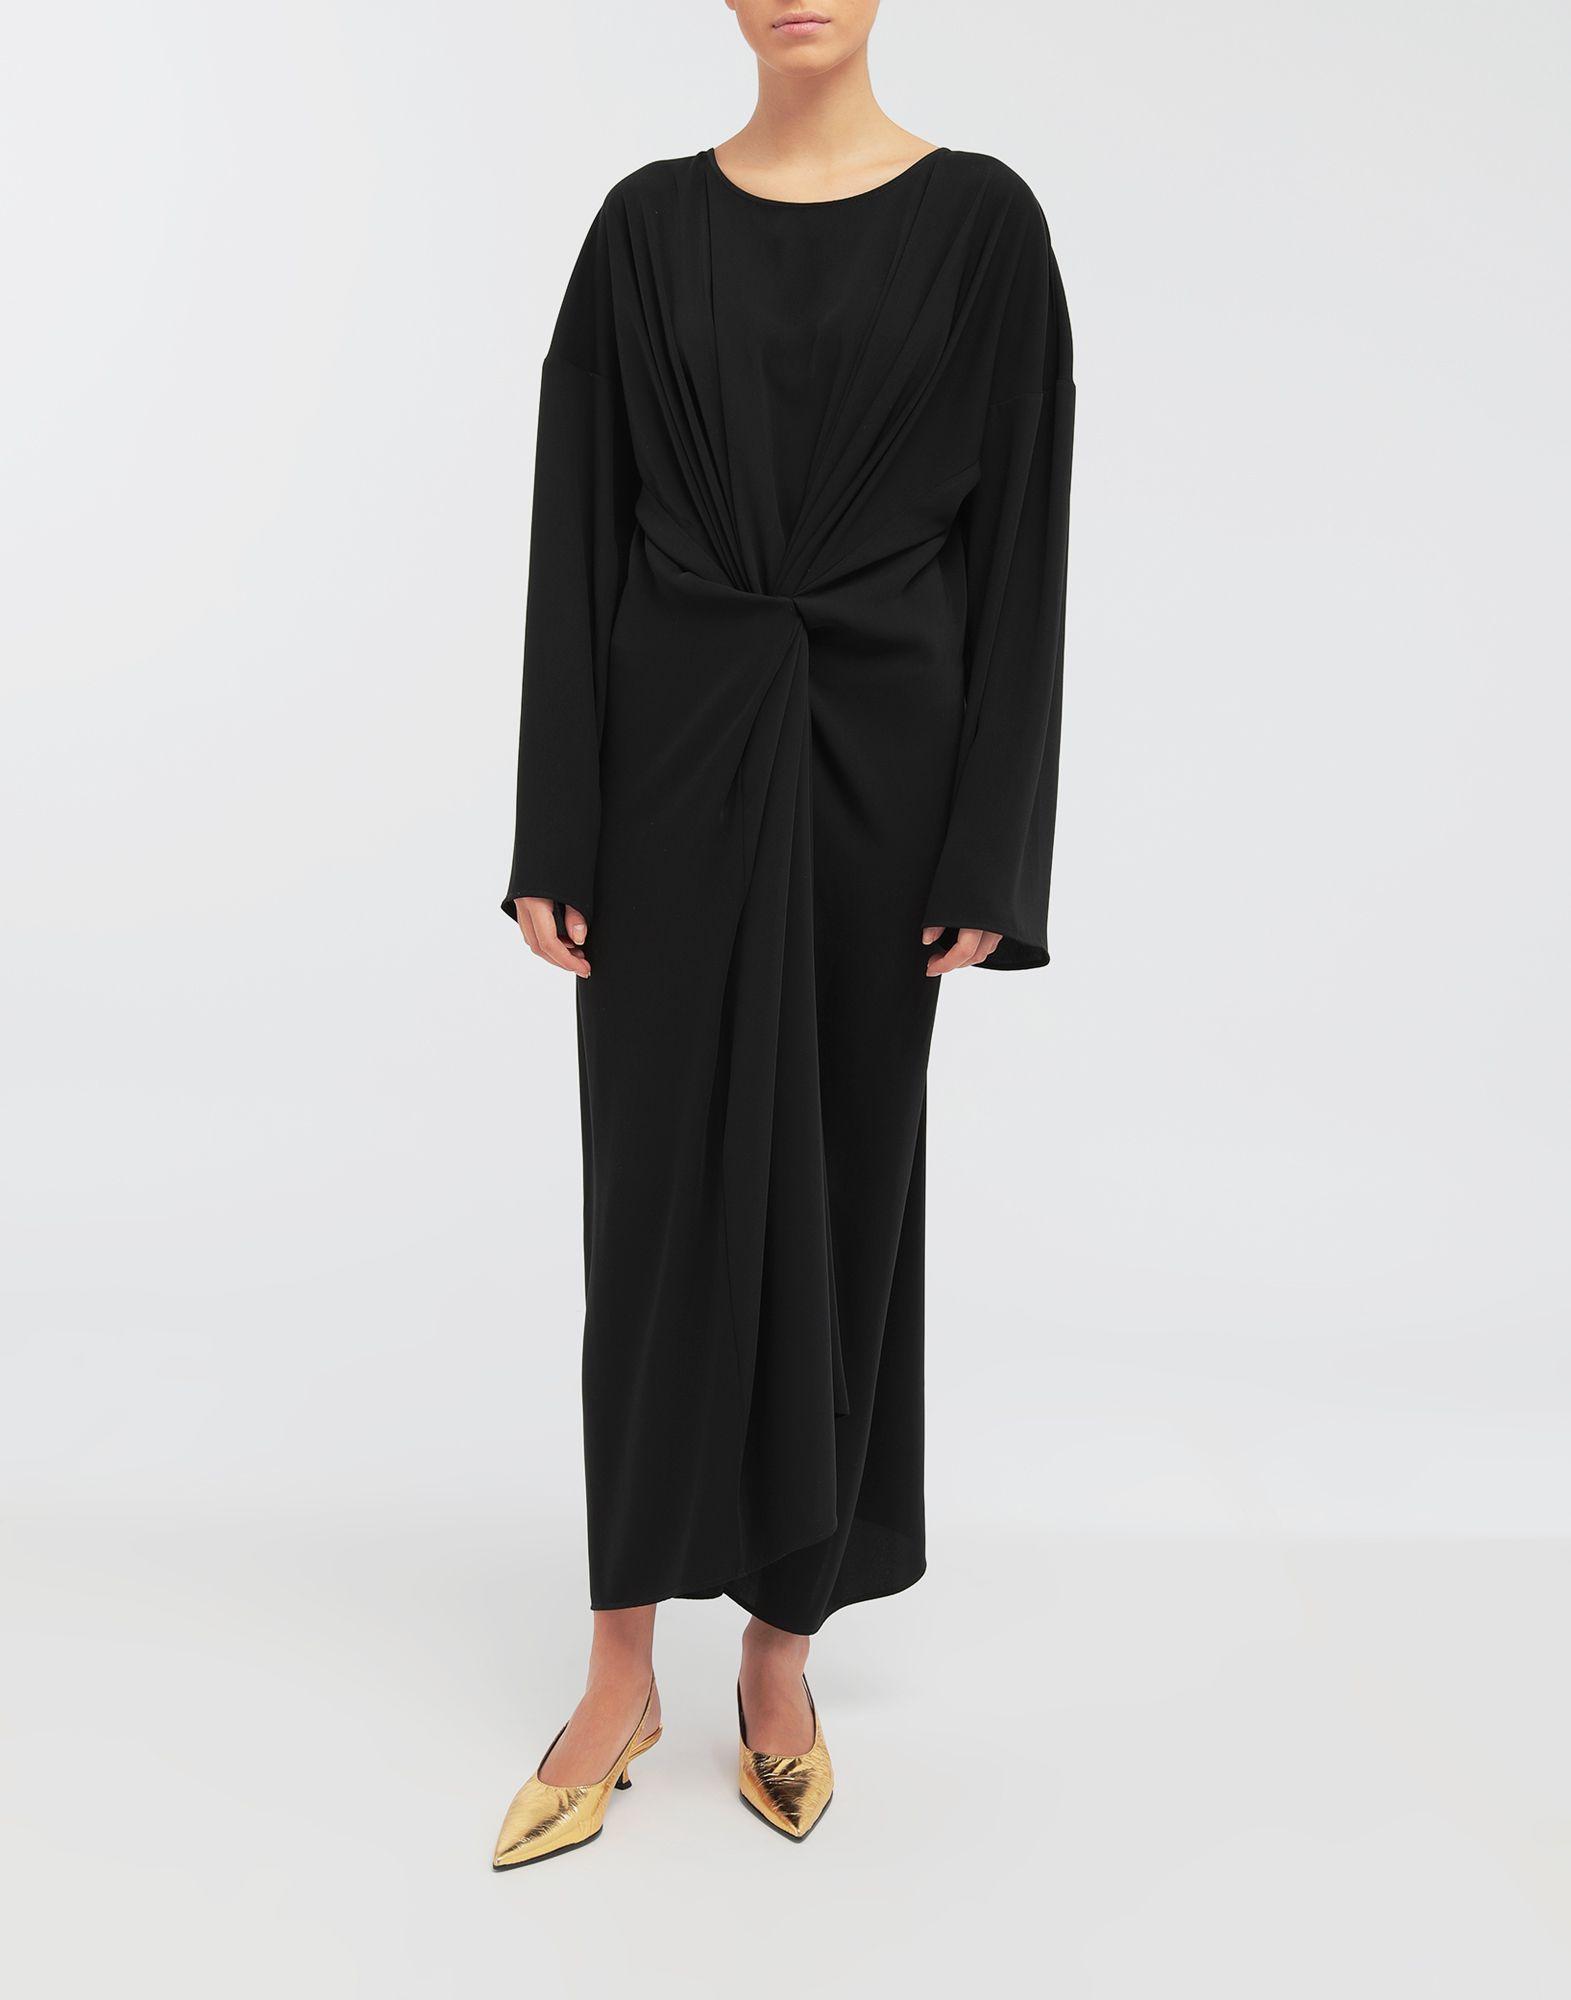 MM6 MAISON MARGIELA Draped maxi dress Long dress Woman r